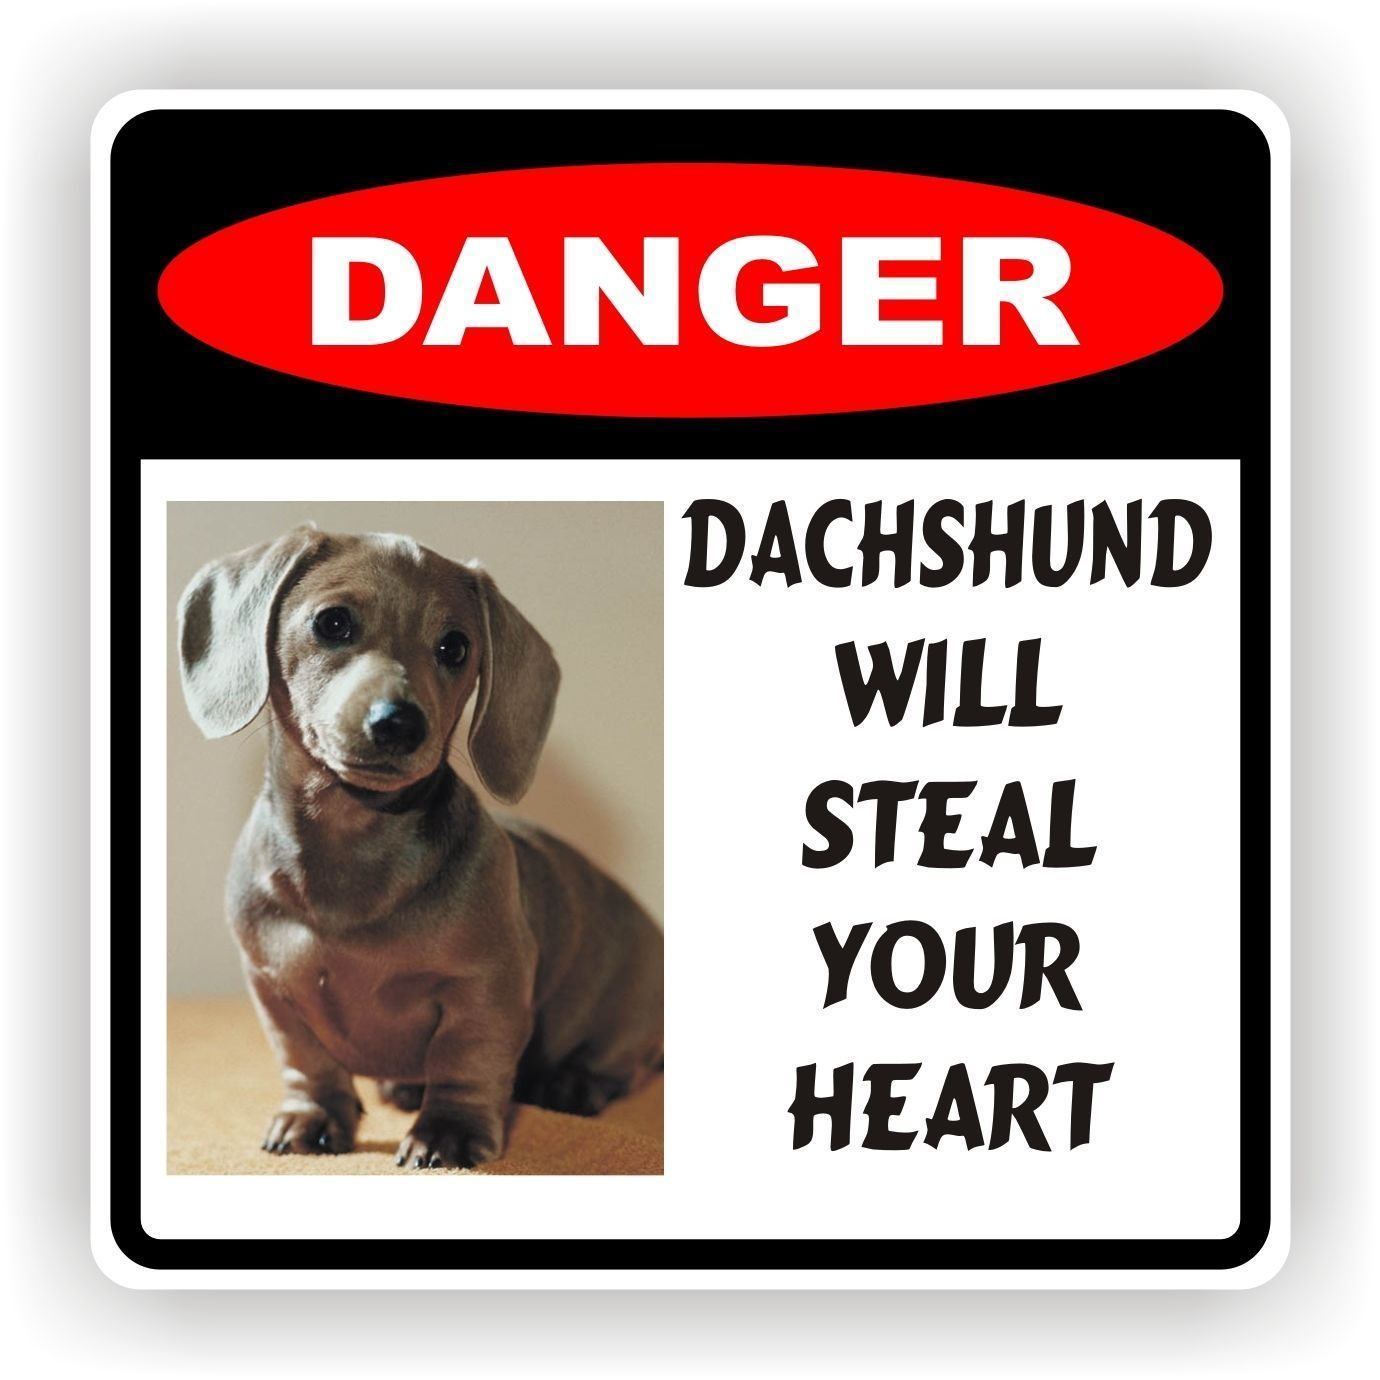 4.99 dachshund Steal Heart Decal Sticker Pet Dog ebay